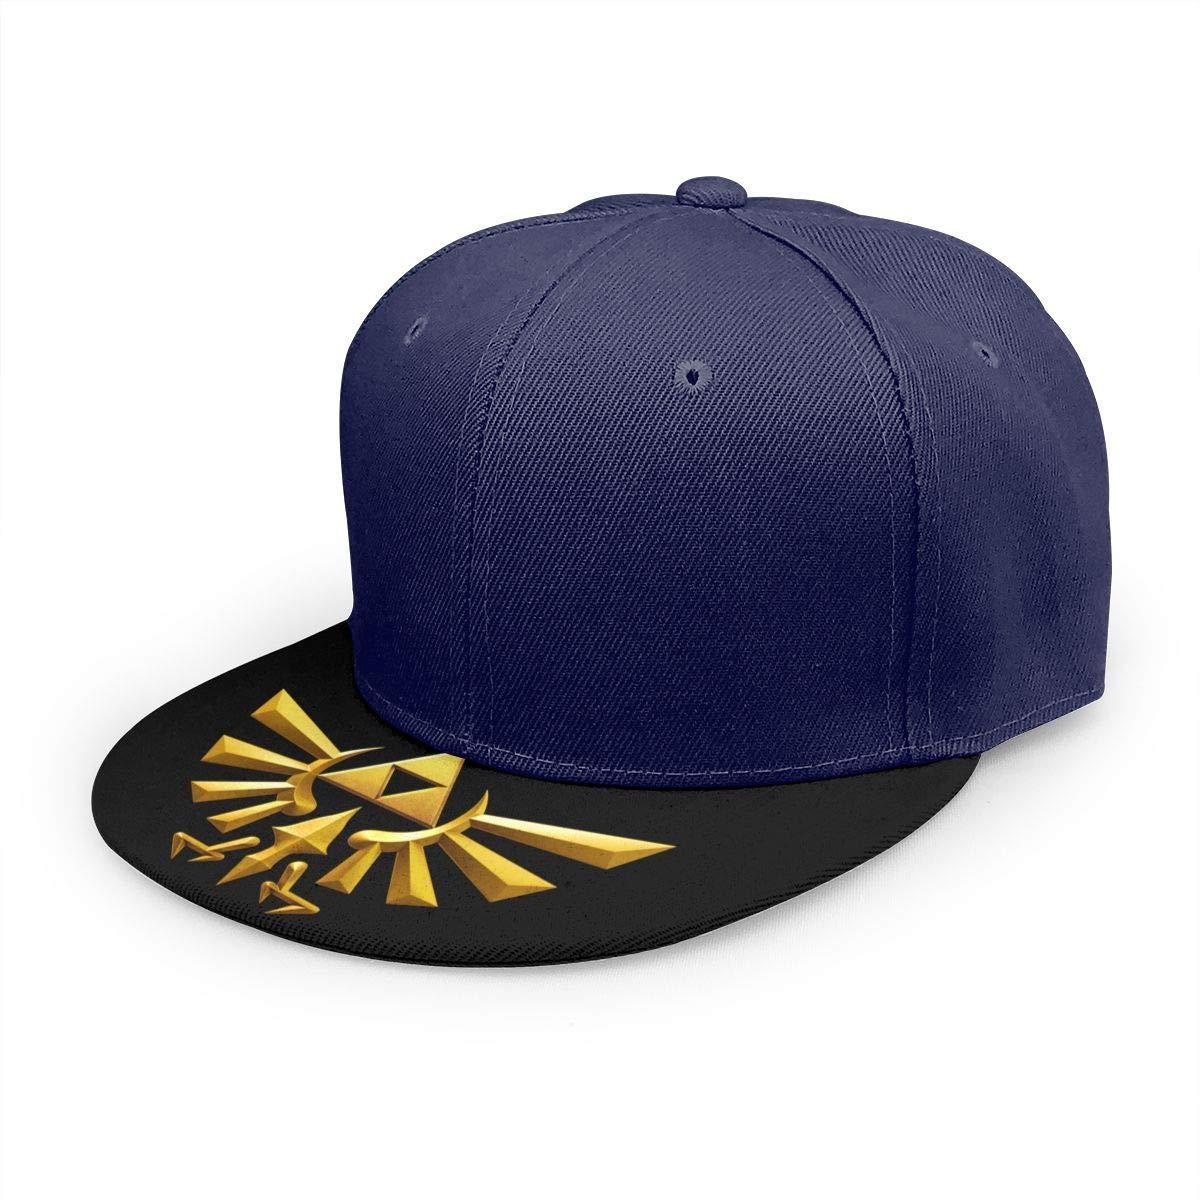 Adjustable Women Men The-Legend-of-Zelda Print Baseball Cap Flat Brim Cap Hats Hip Hop Snapback Sun Hat Boys Girls Navy by Apolonia